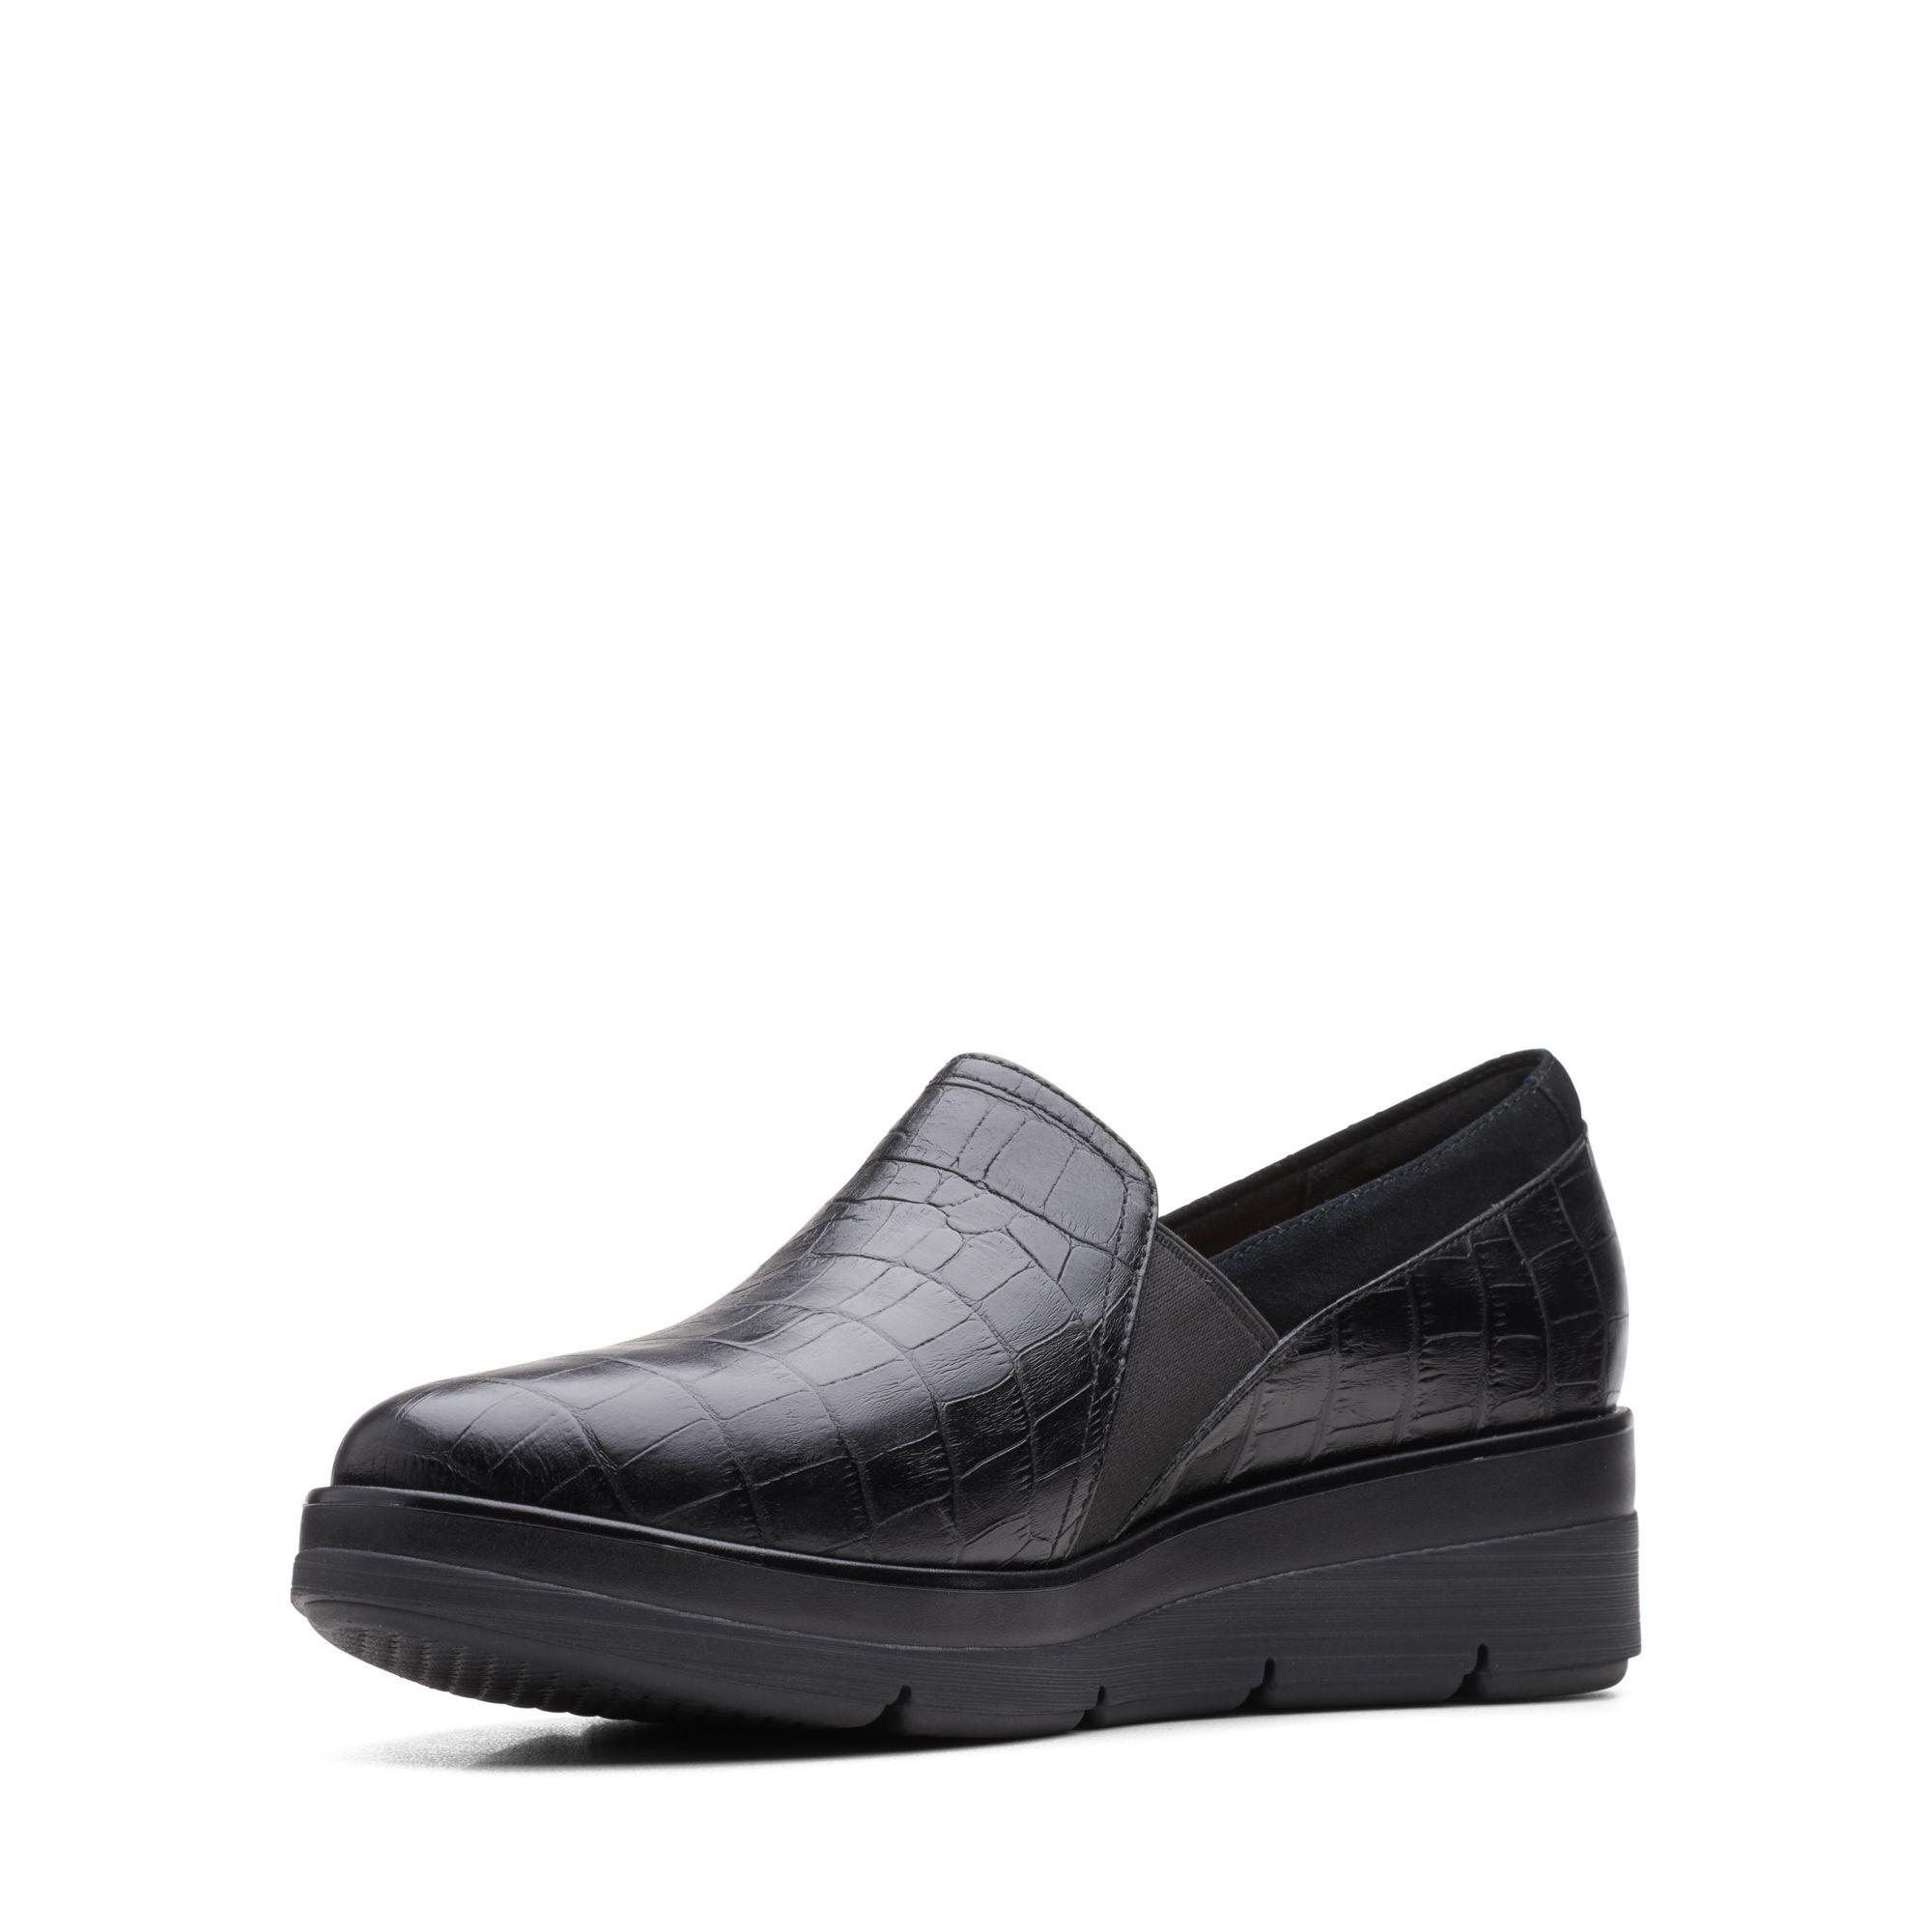 Дамски обувки Clarks Shaylin Ave Black Croc - снимка 4